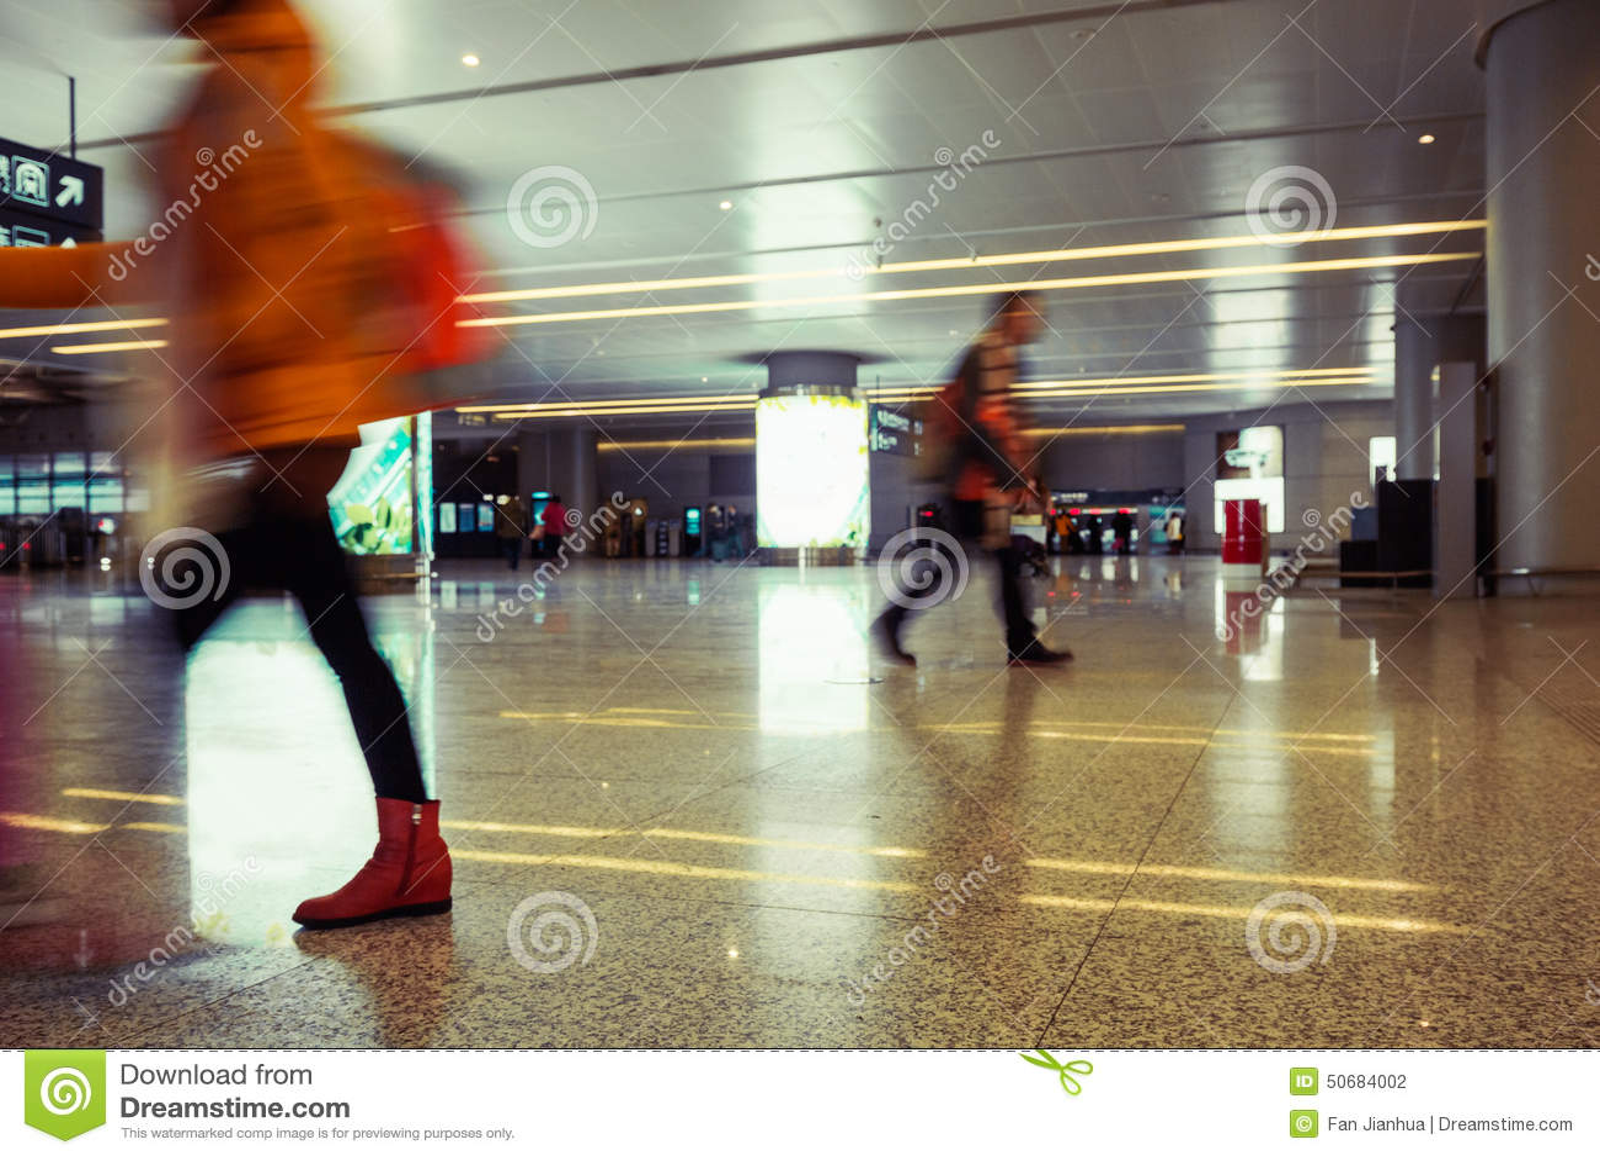 Download 机场隧道和步行者 库存照片. 图片 包括有 旅游业, 模糊, 室内, 乘客, 购物, 休闲, 城市, 陆运 - 50684002